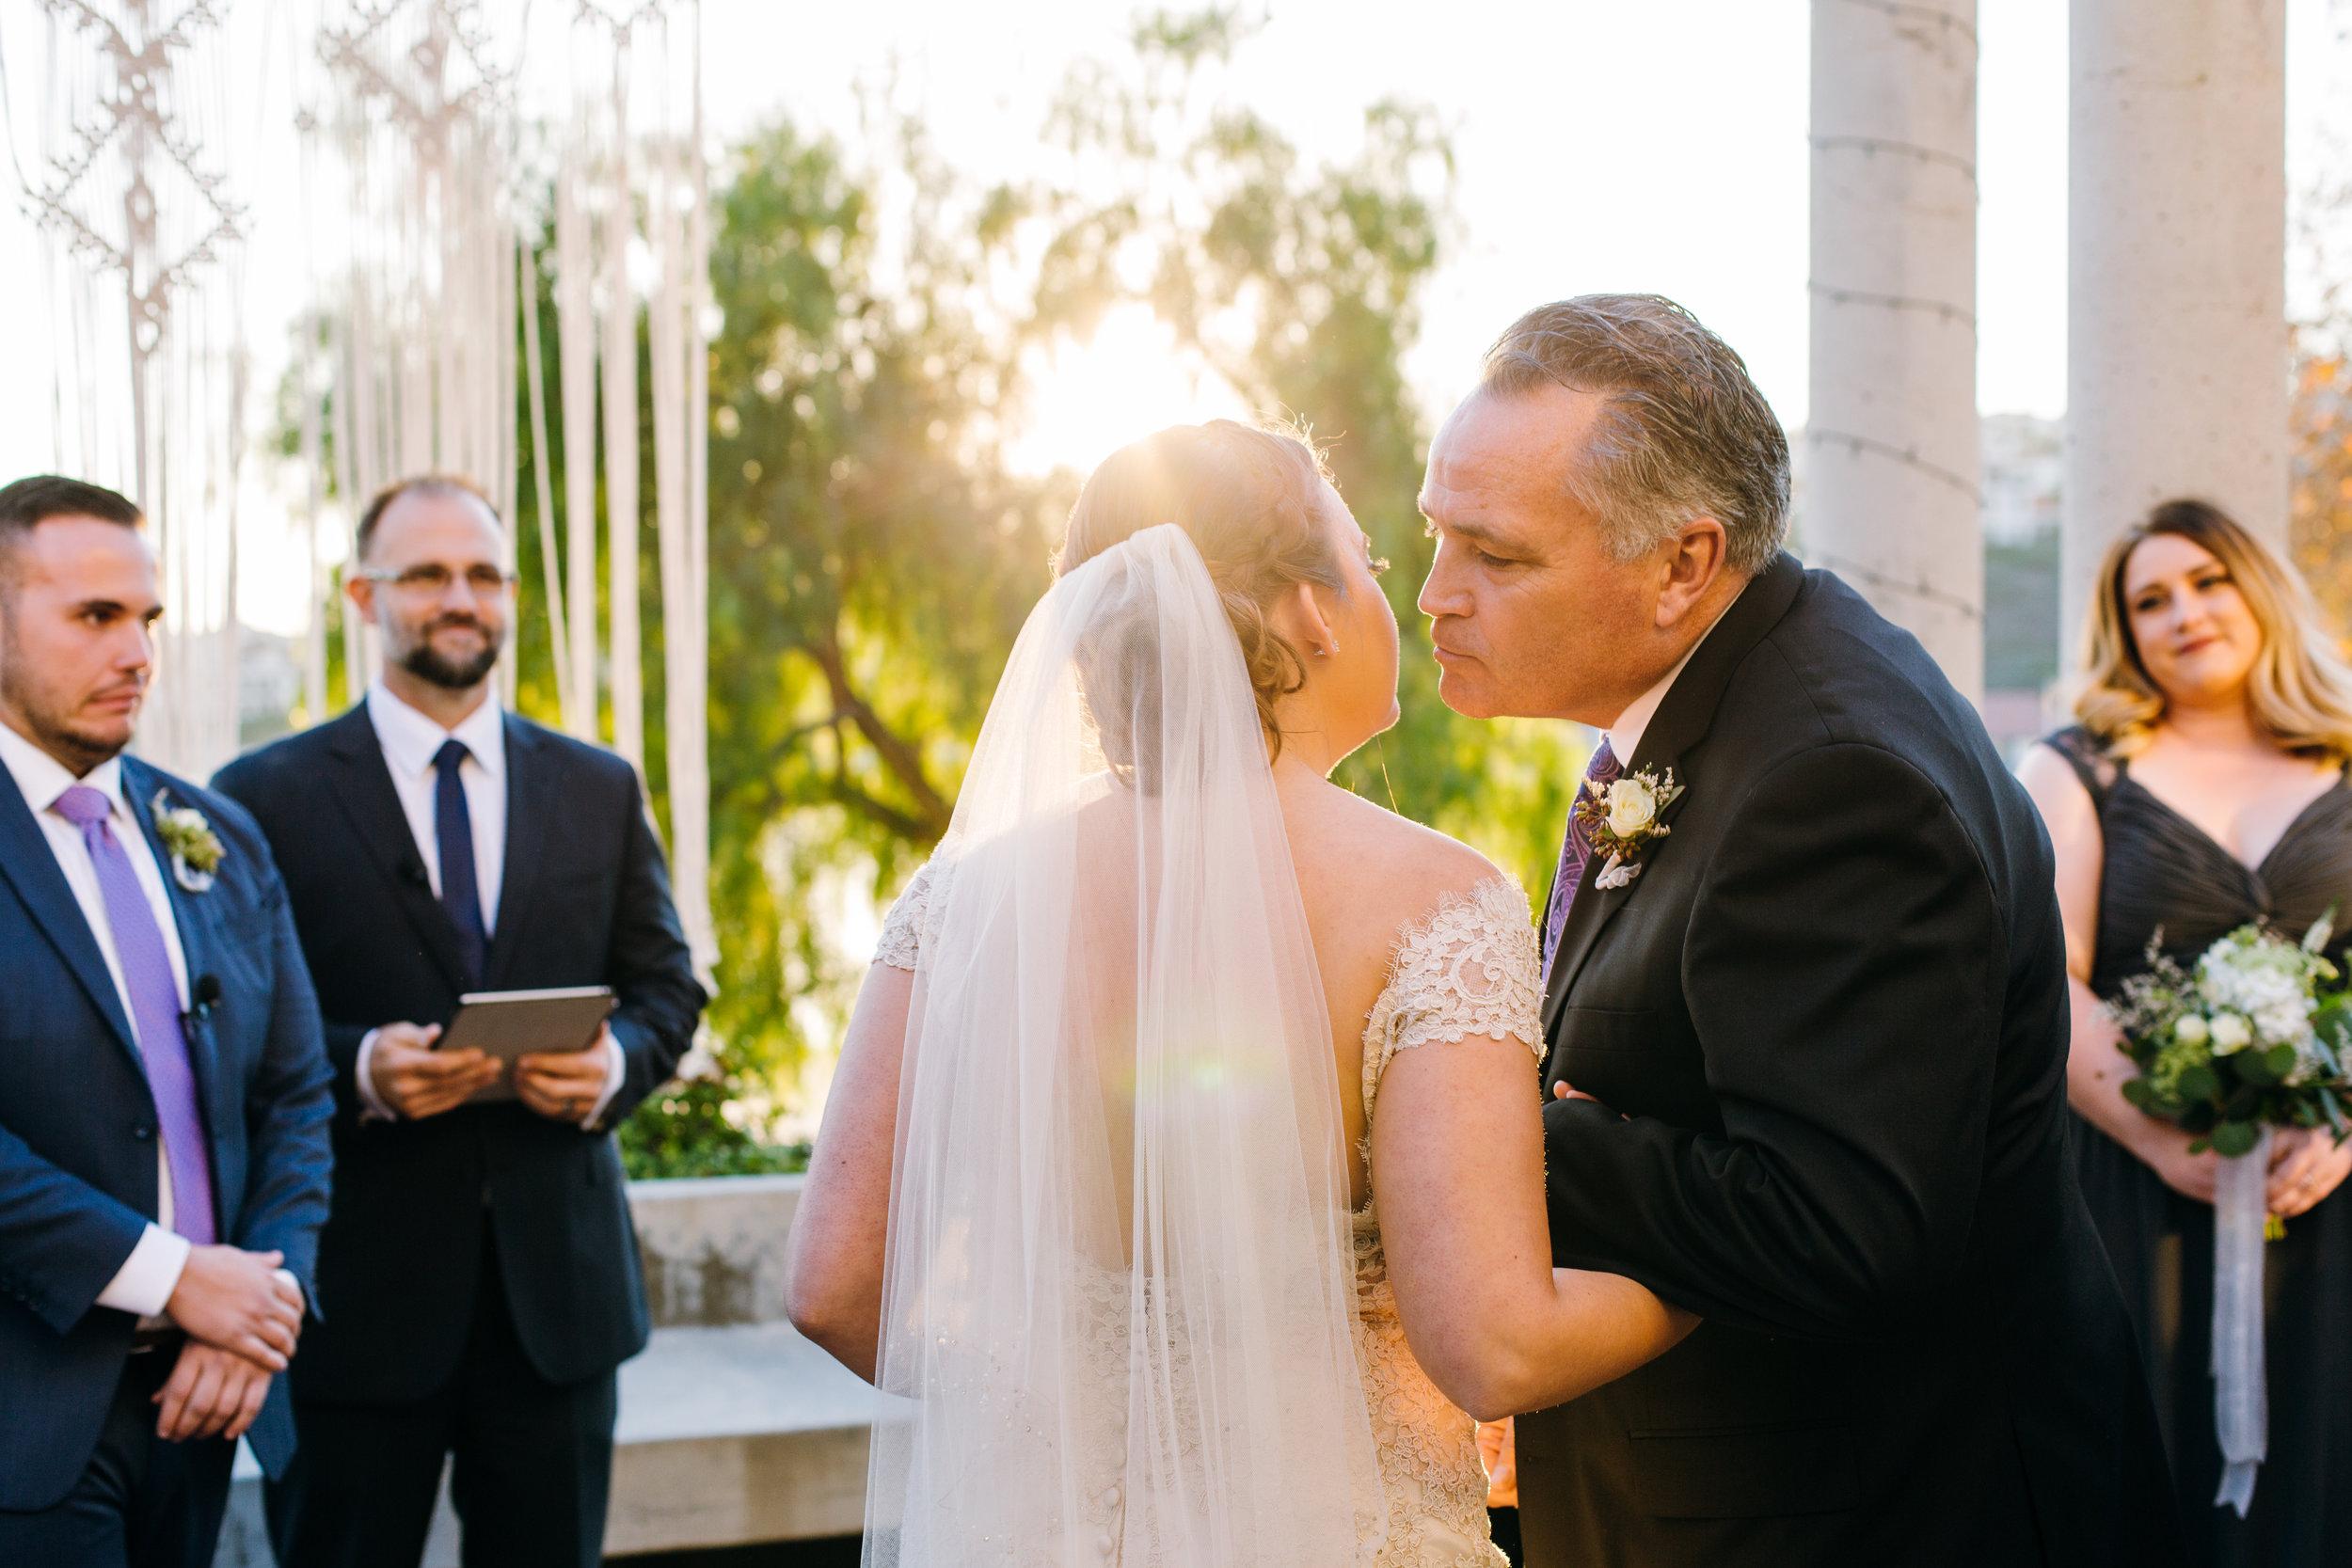 KaraNixonWeddings-DanaPoint-Wedding-25.jpg